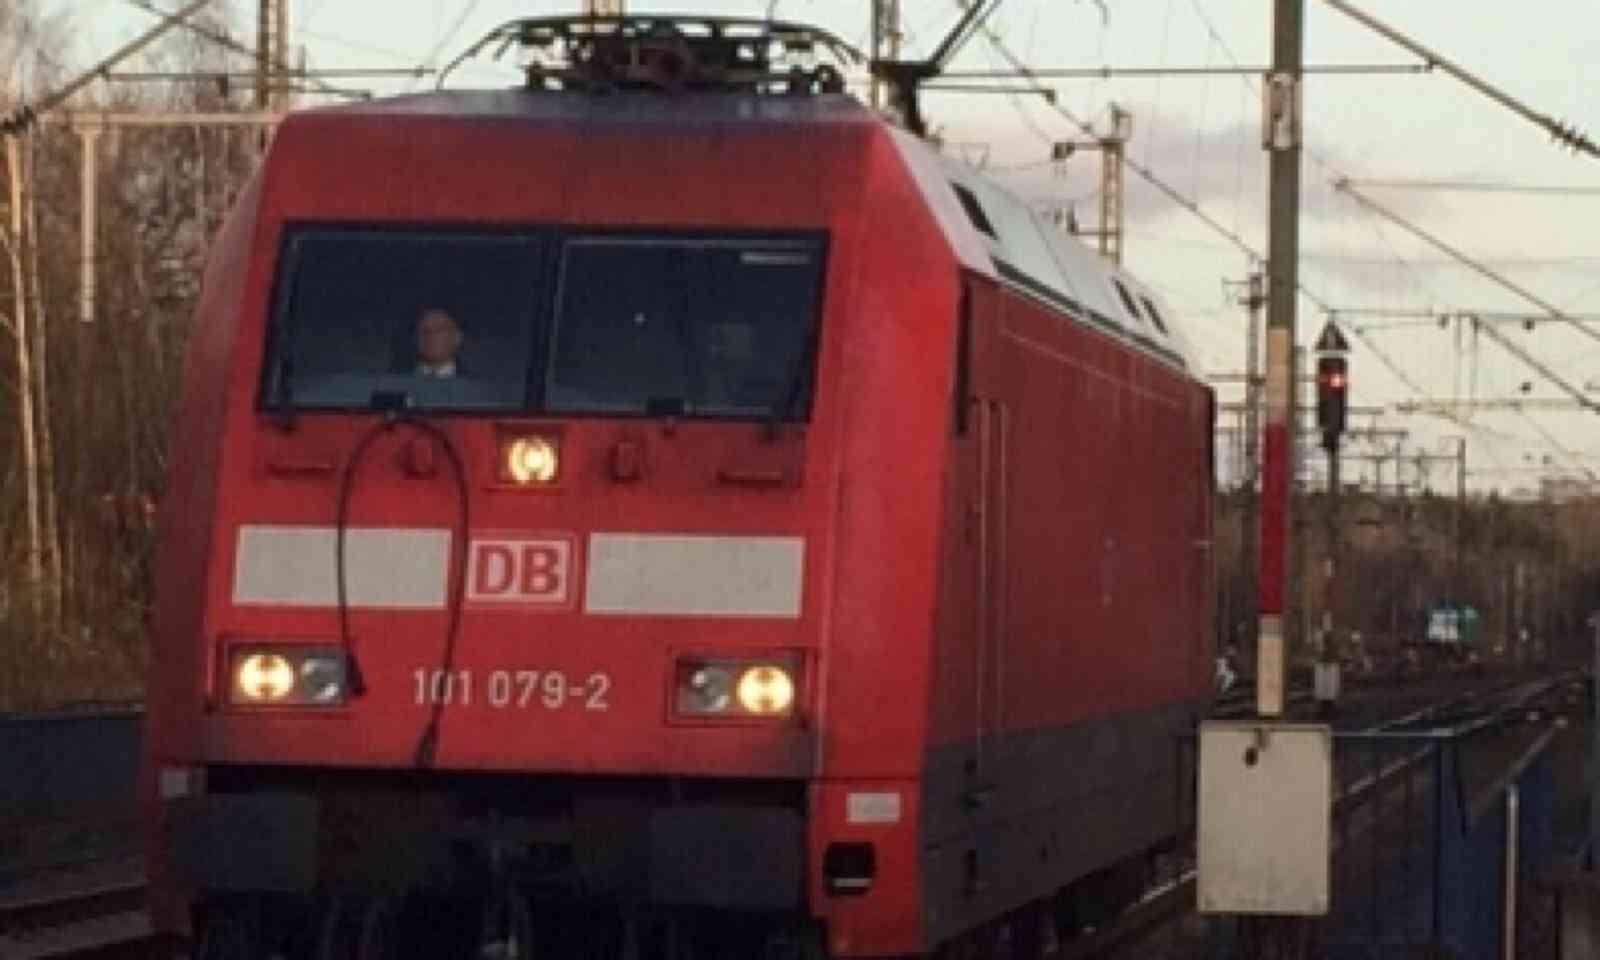 DB Bahn Loco (Matthew Woodward)